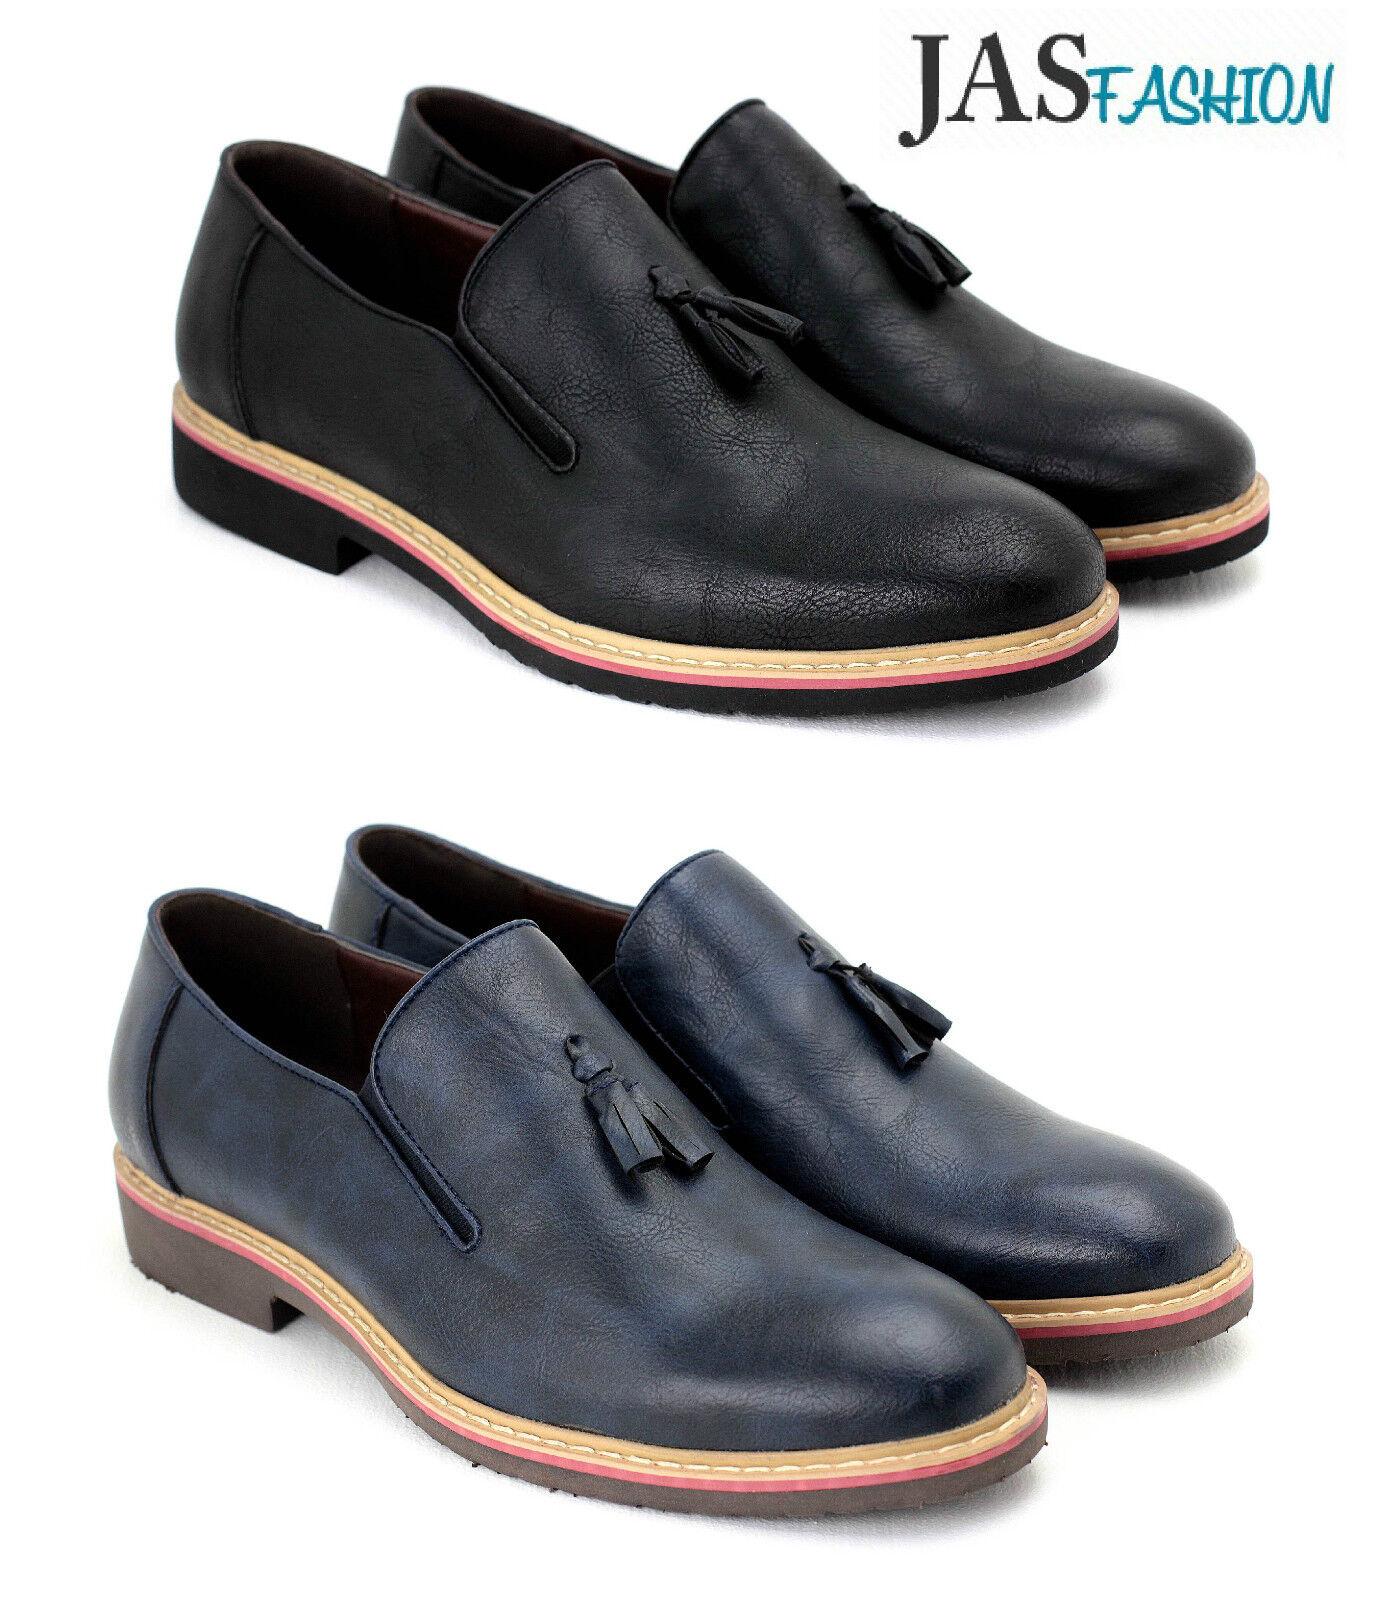 Mens Tassel Shoes Next